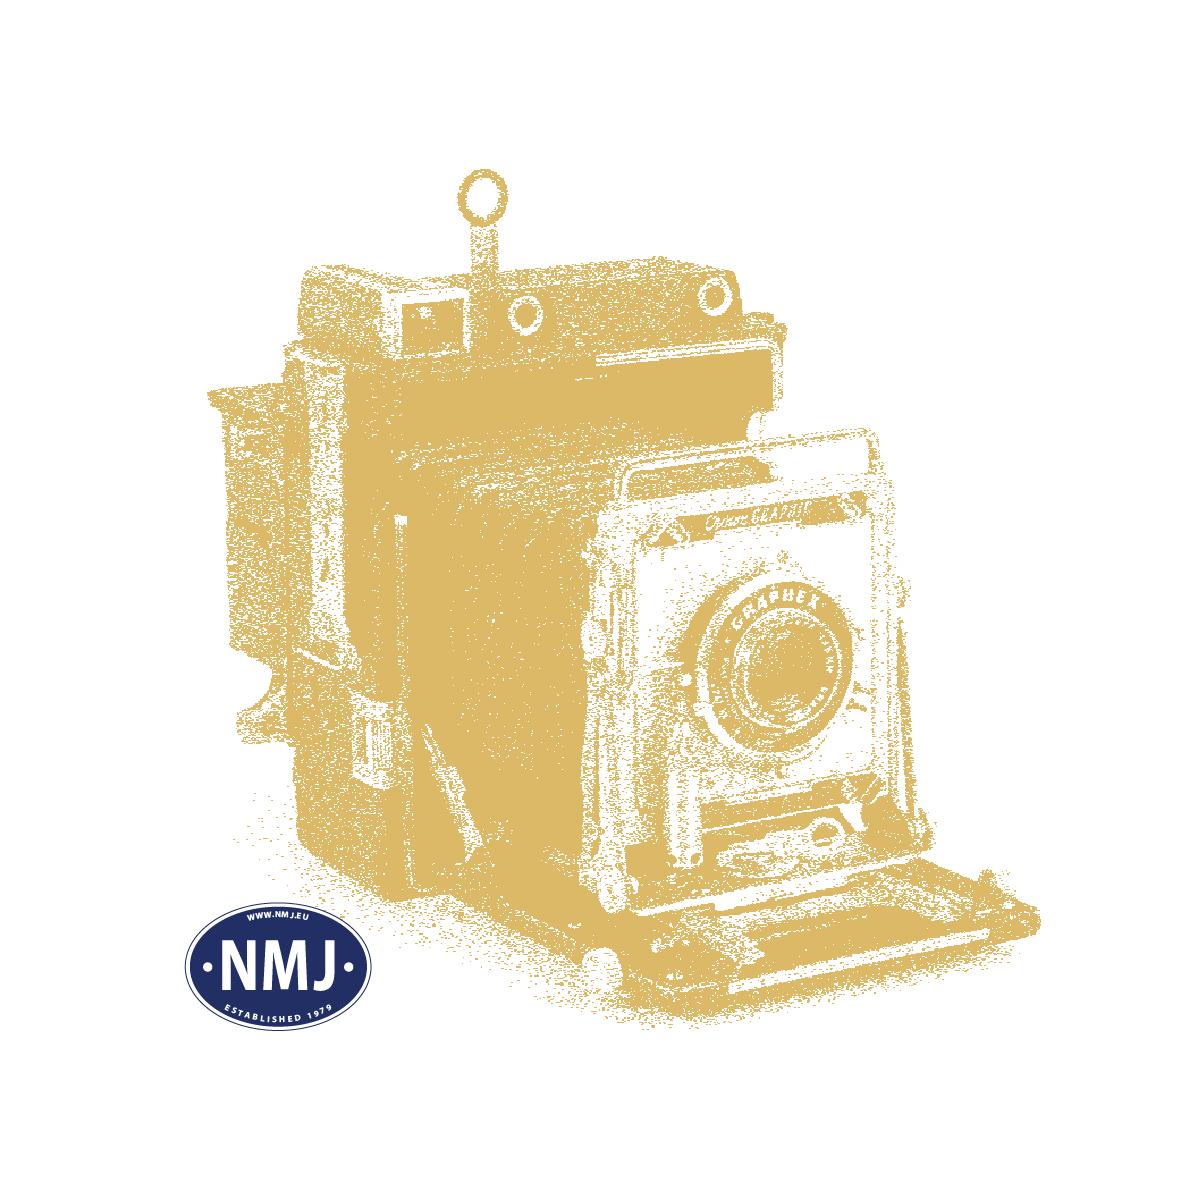 NMJT105.990 - NMJ Topline NSB B3 DCC interiørlyssett